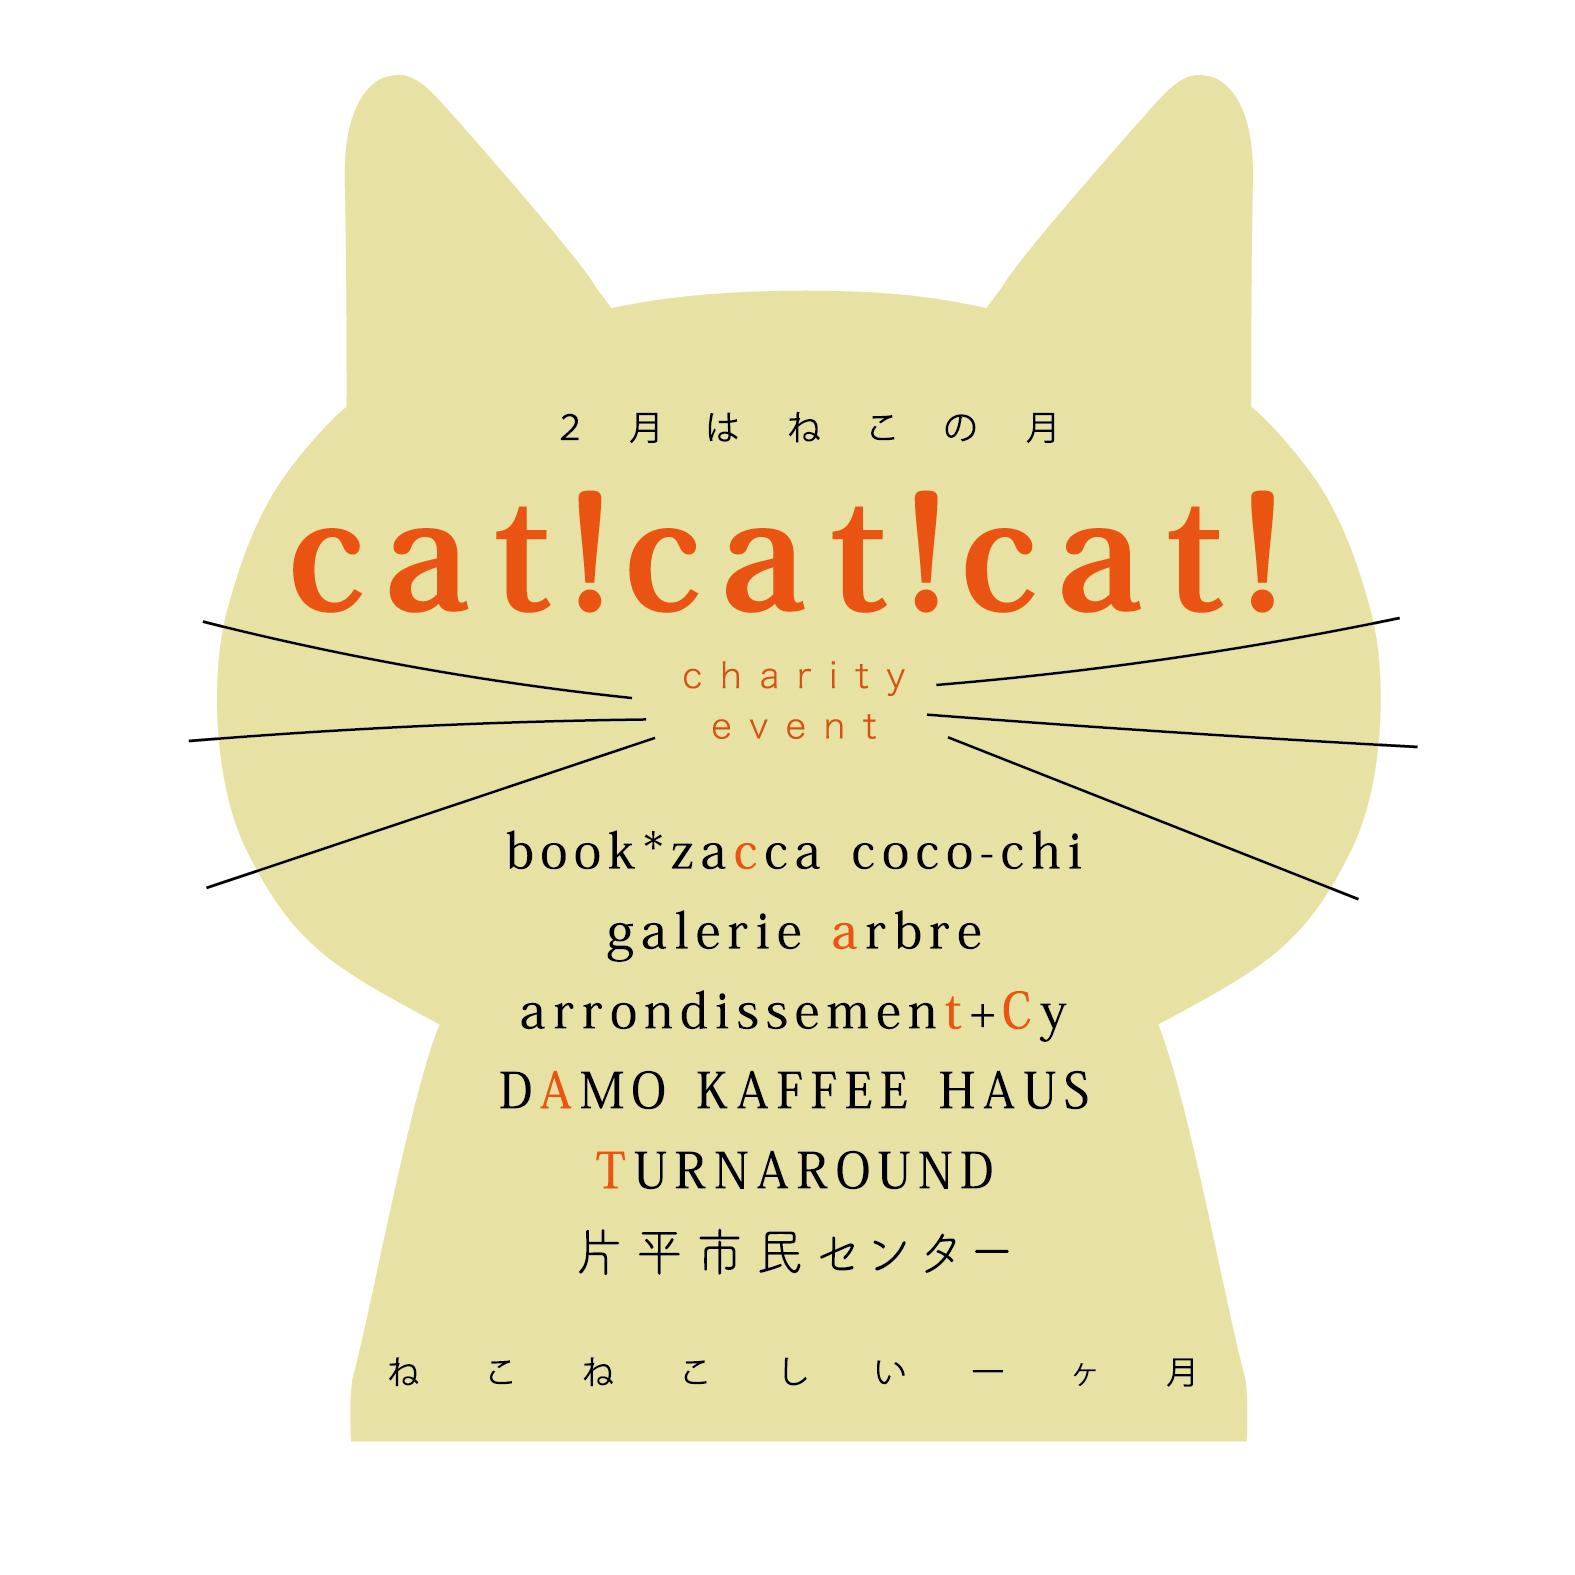 catcatcat_sendai1-01.jpg